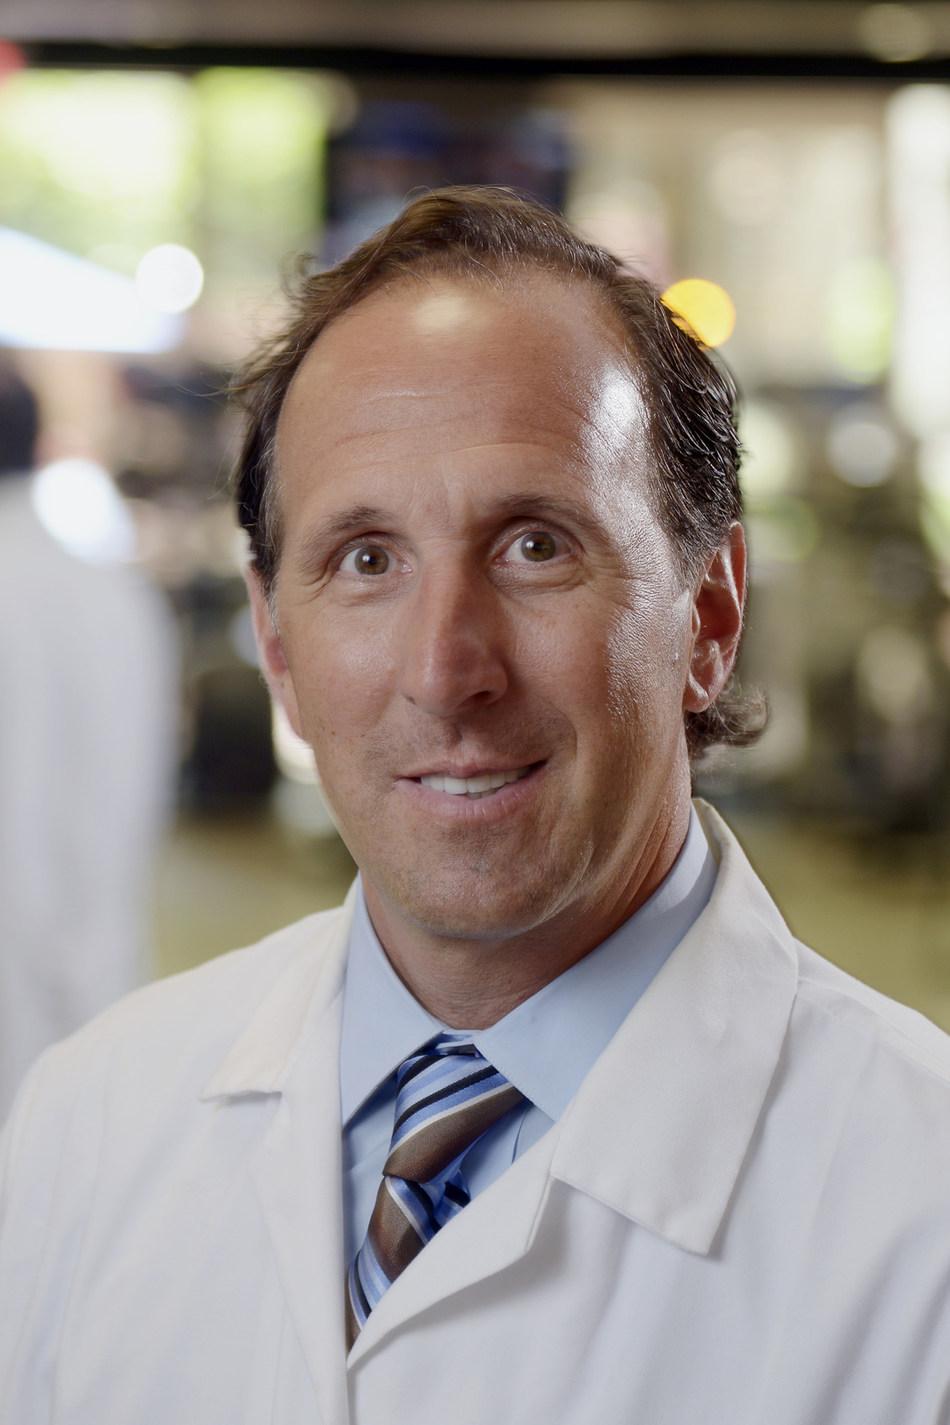 William M. Ricci, MD